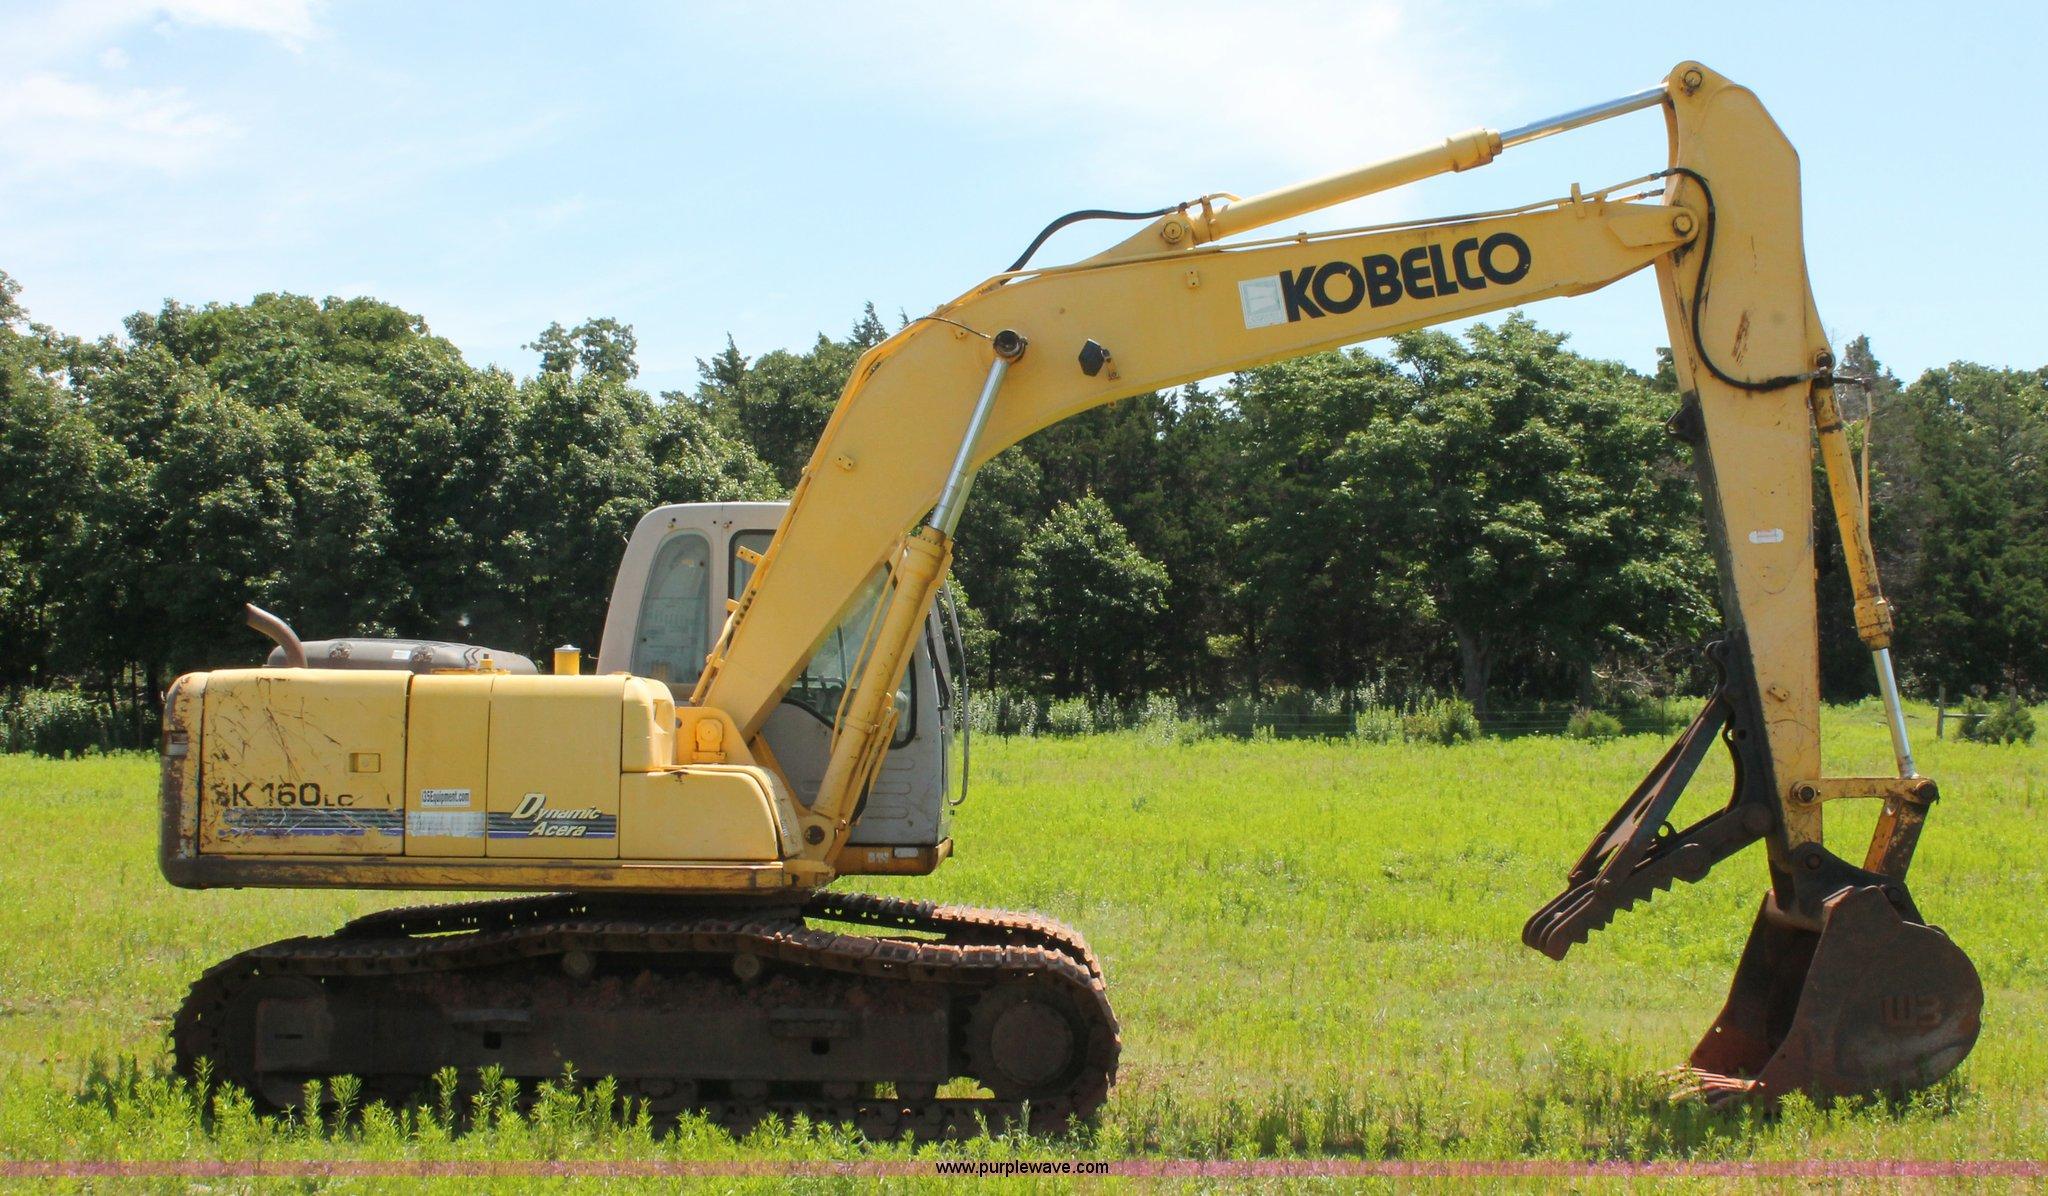 ... Kobelco SK160LC excavator Full size in new window ...